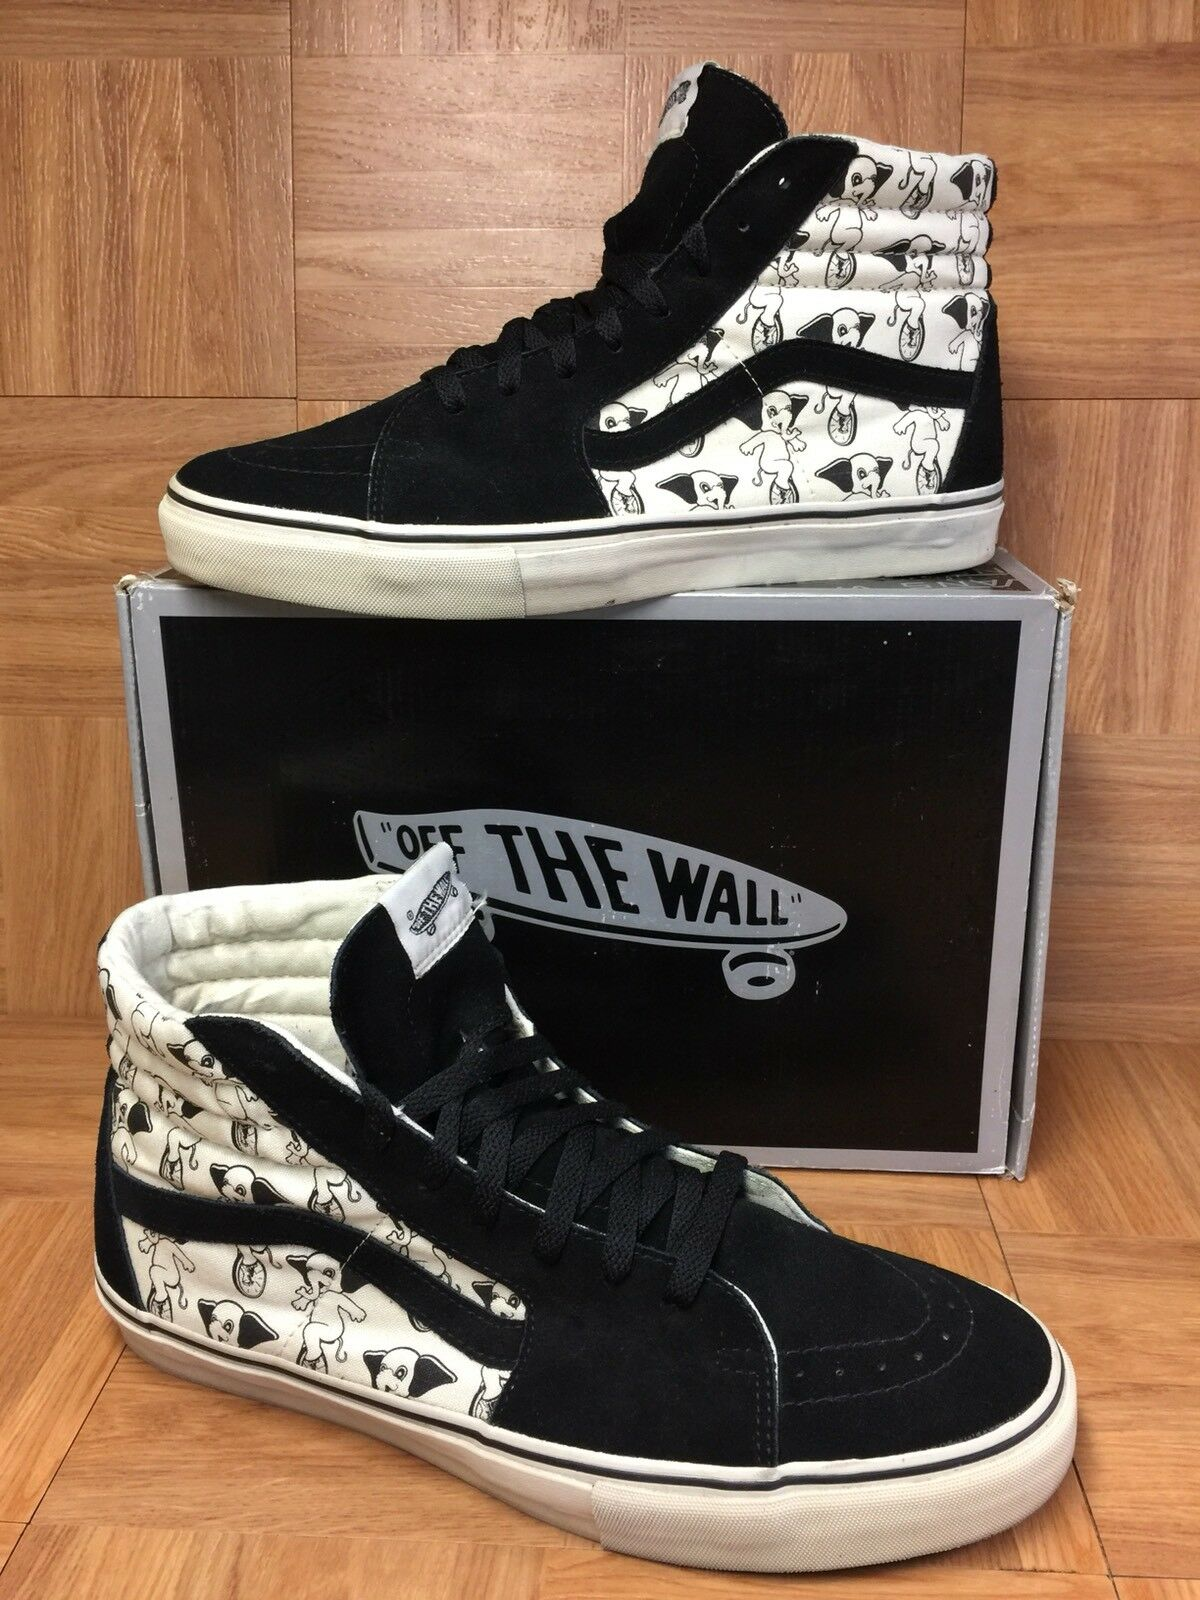 EUC� VANS Sk8-Hi Vault LX Uniphant Sz 13 Skateboarding Shoes Black Turtledove